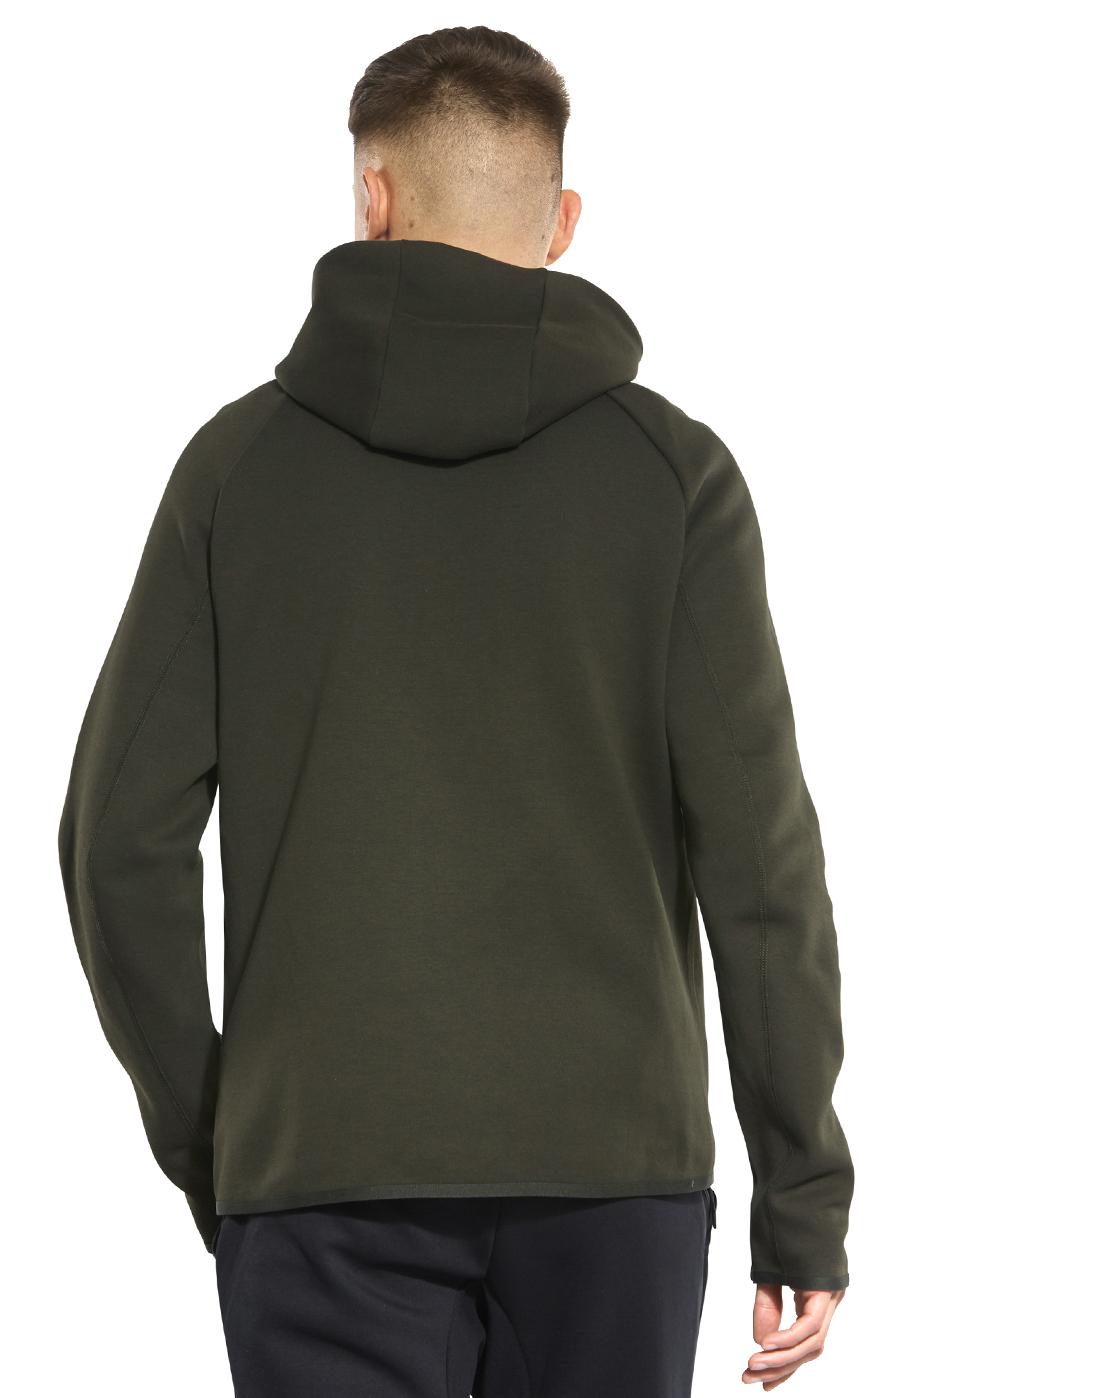 af7e59a0546 Mens Full Zip Tech Fleece Hoody · Mens Full Zip Tech Fleece Hoody ...